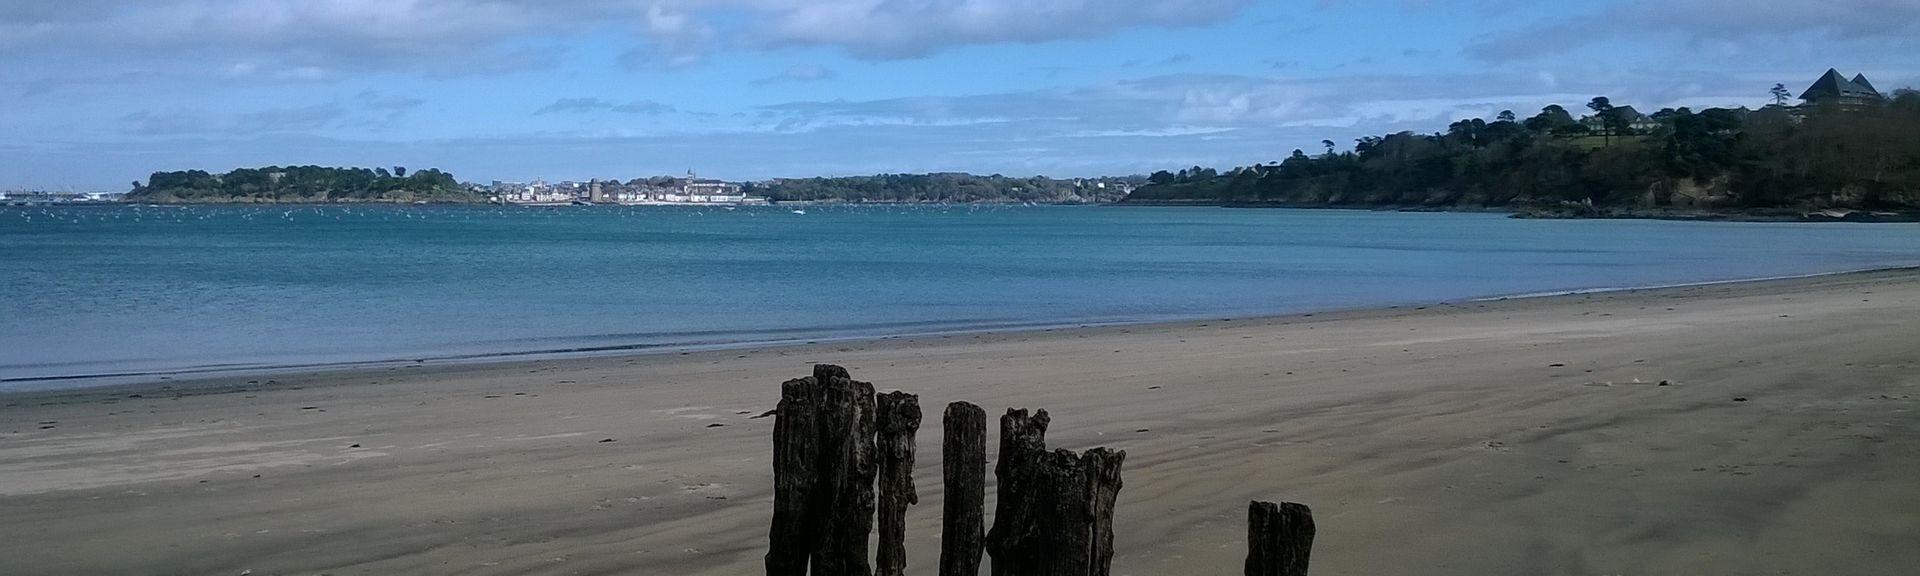 Calorguen, Bretagne, France